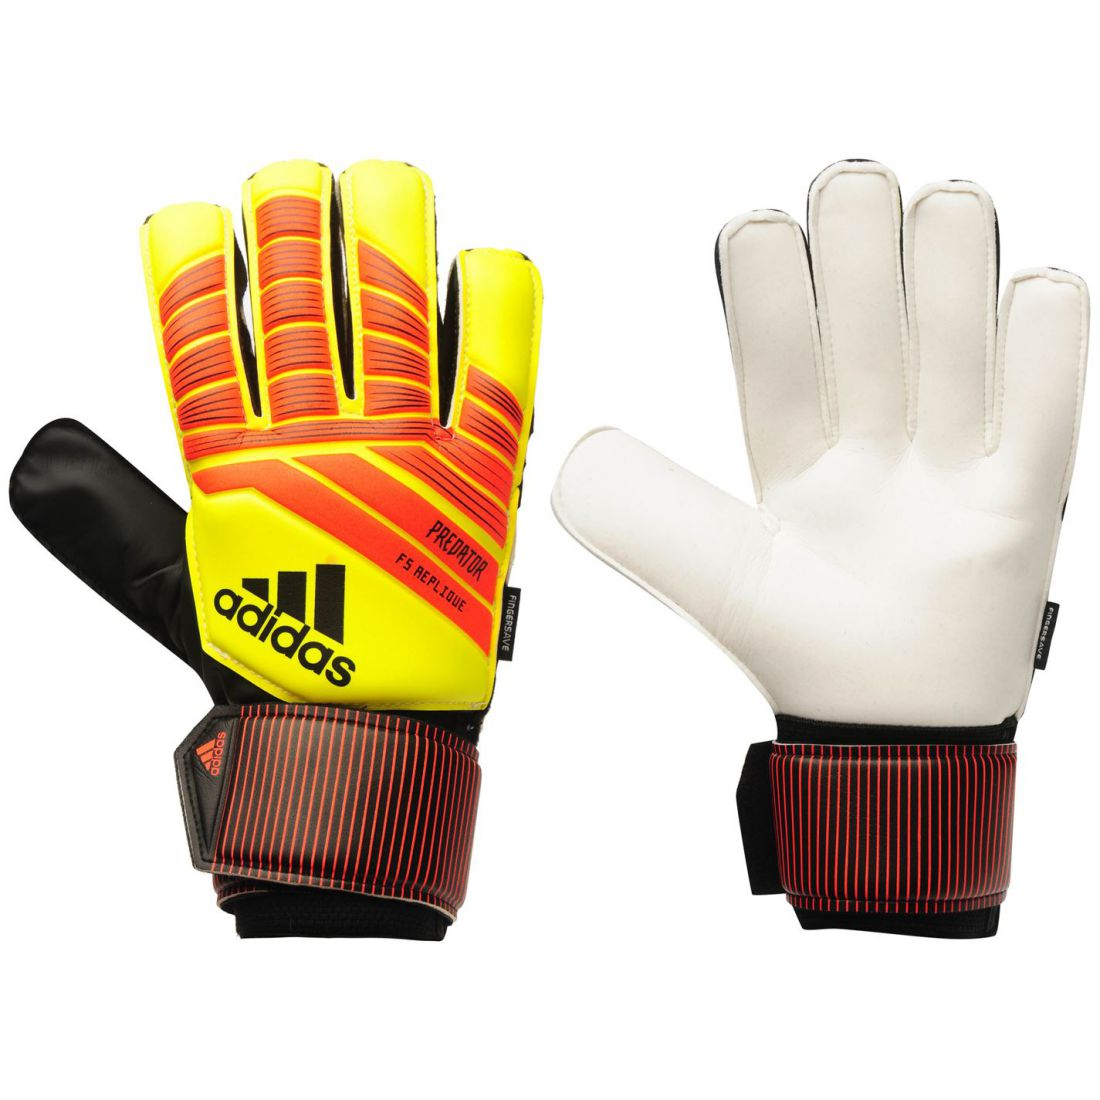 bcac491008d ADIDAS PREDATOR FS Replique Gloves Unisex Goalkeeper Sport - EUR 30 ...